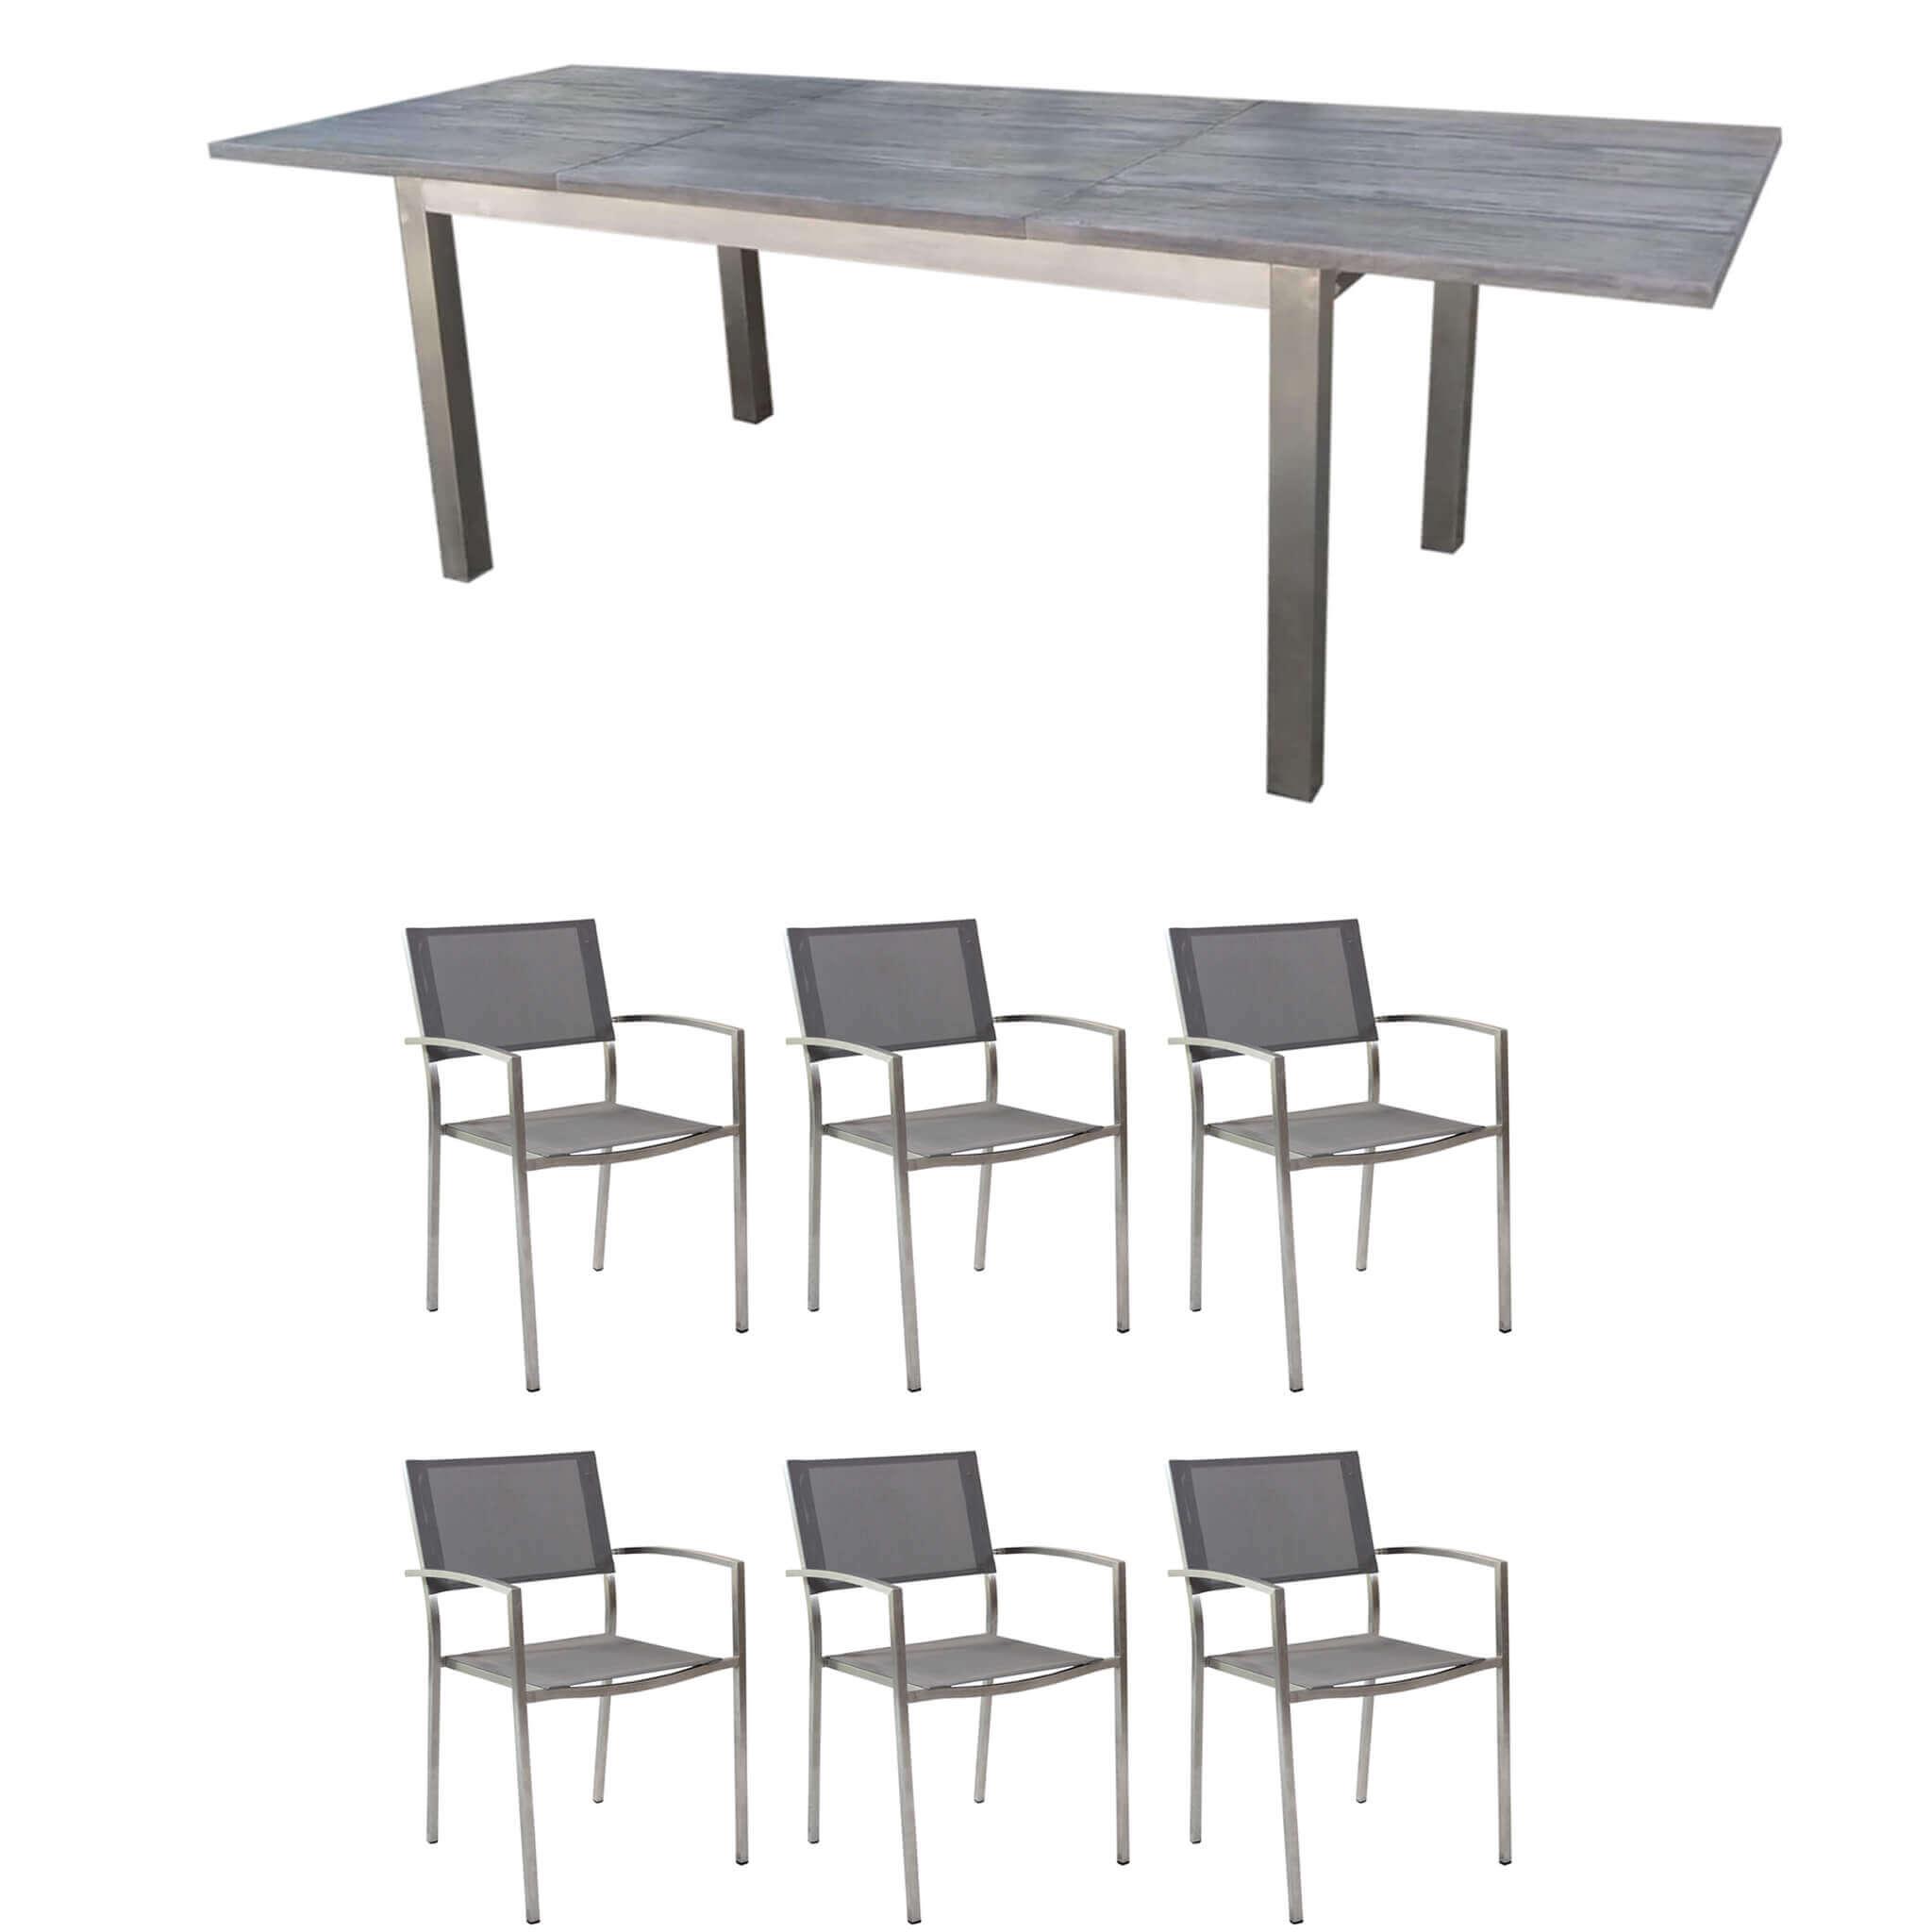 milani home jupiter - set tavolo in teak e acciaio cm 200/300 x 95 x 75 h con 6 sedute